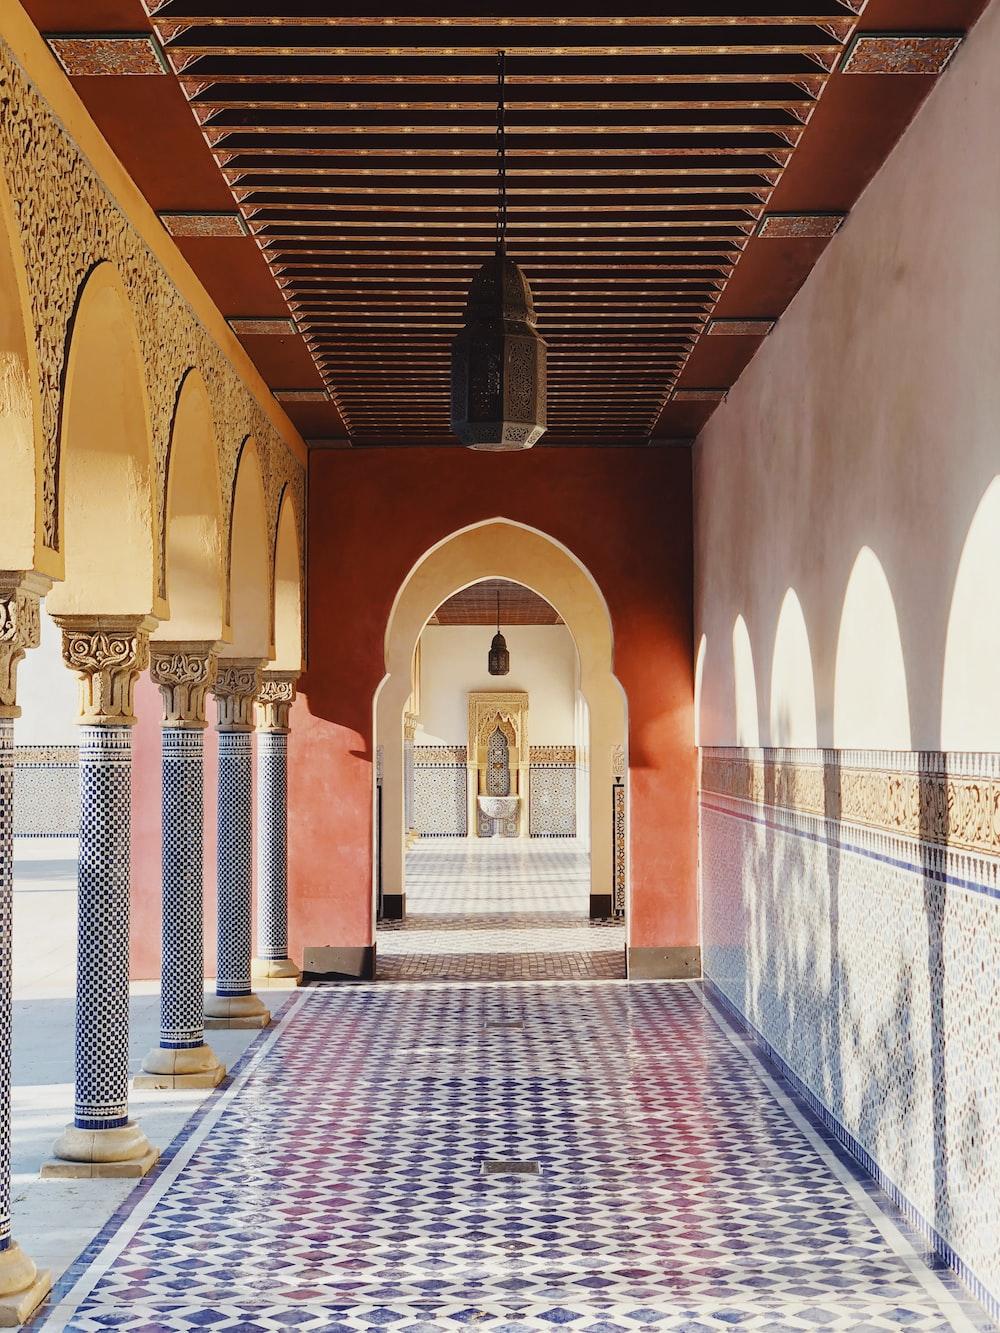 concrete hallway at daytime